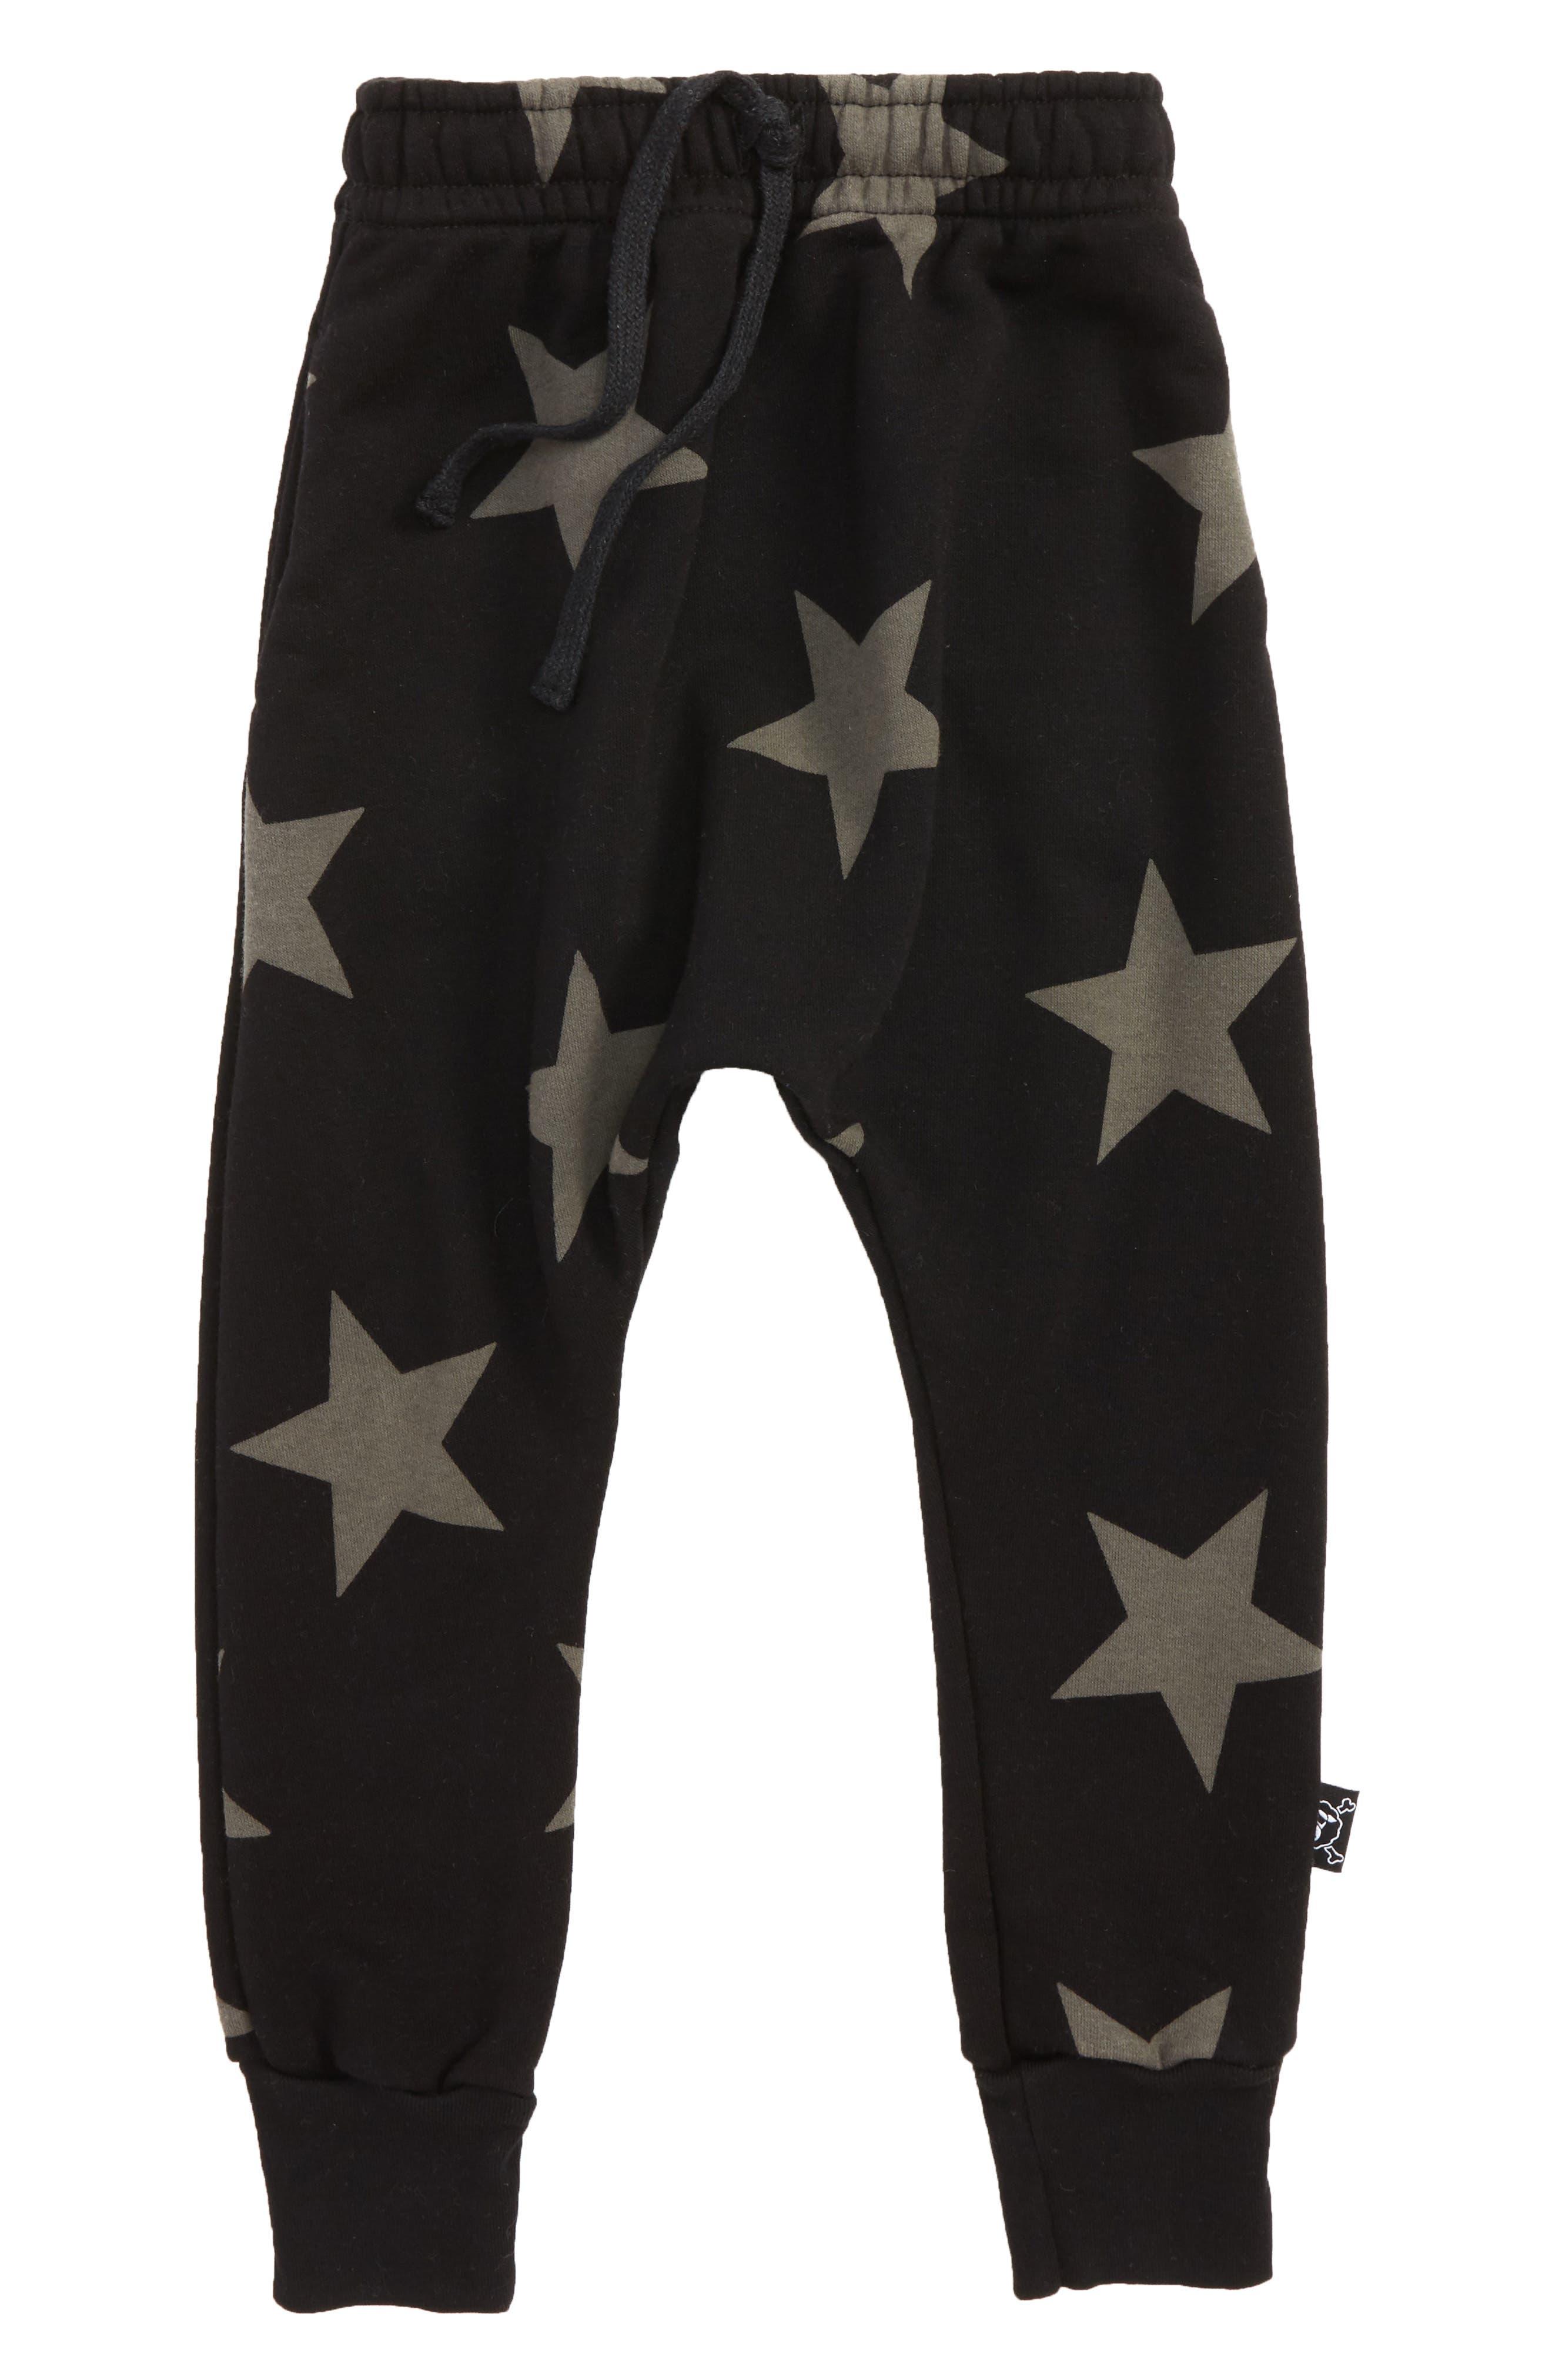 NUNUNU Star Print Jogger Pants (Toddler Boys & Little Boys)